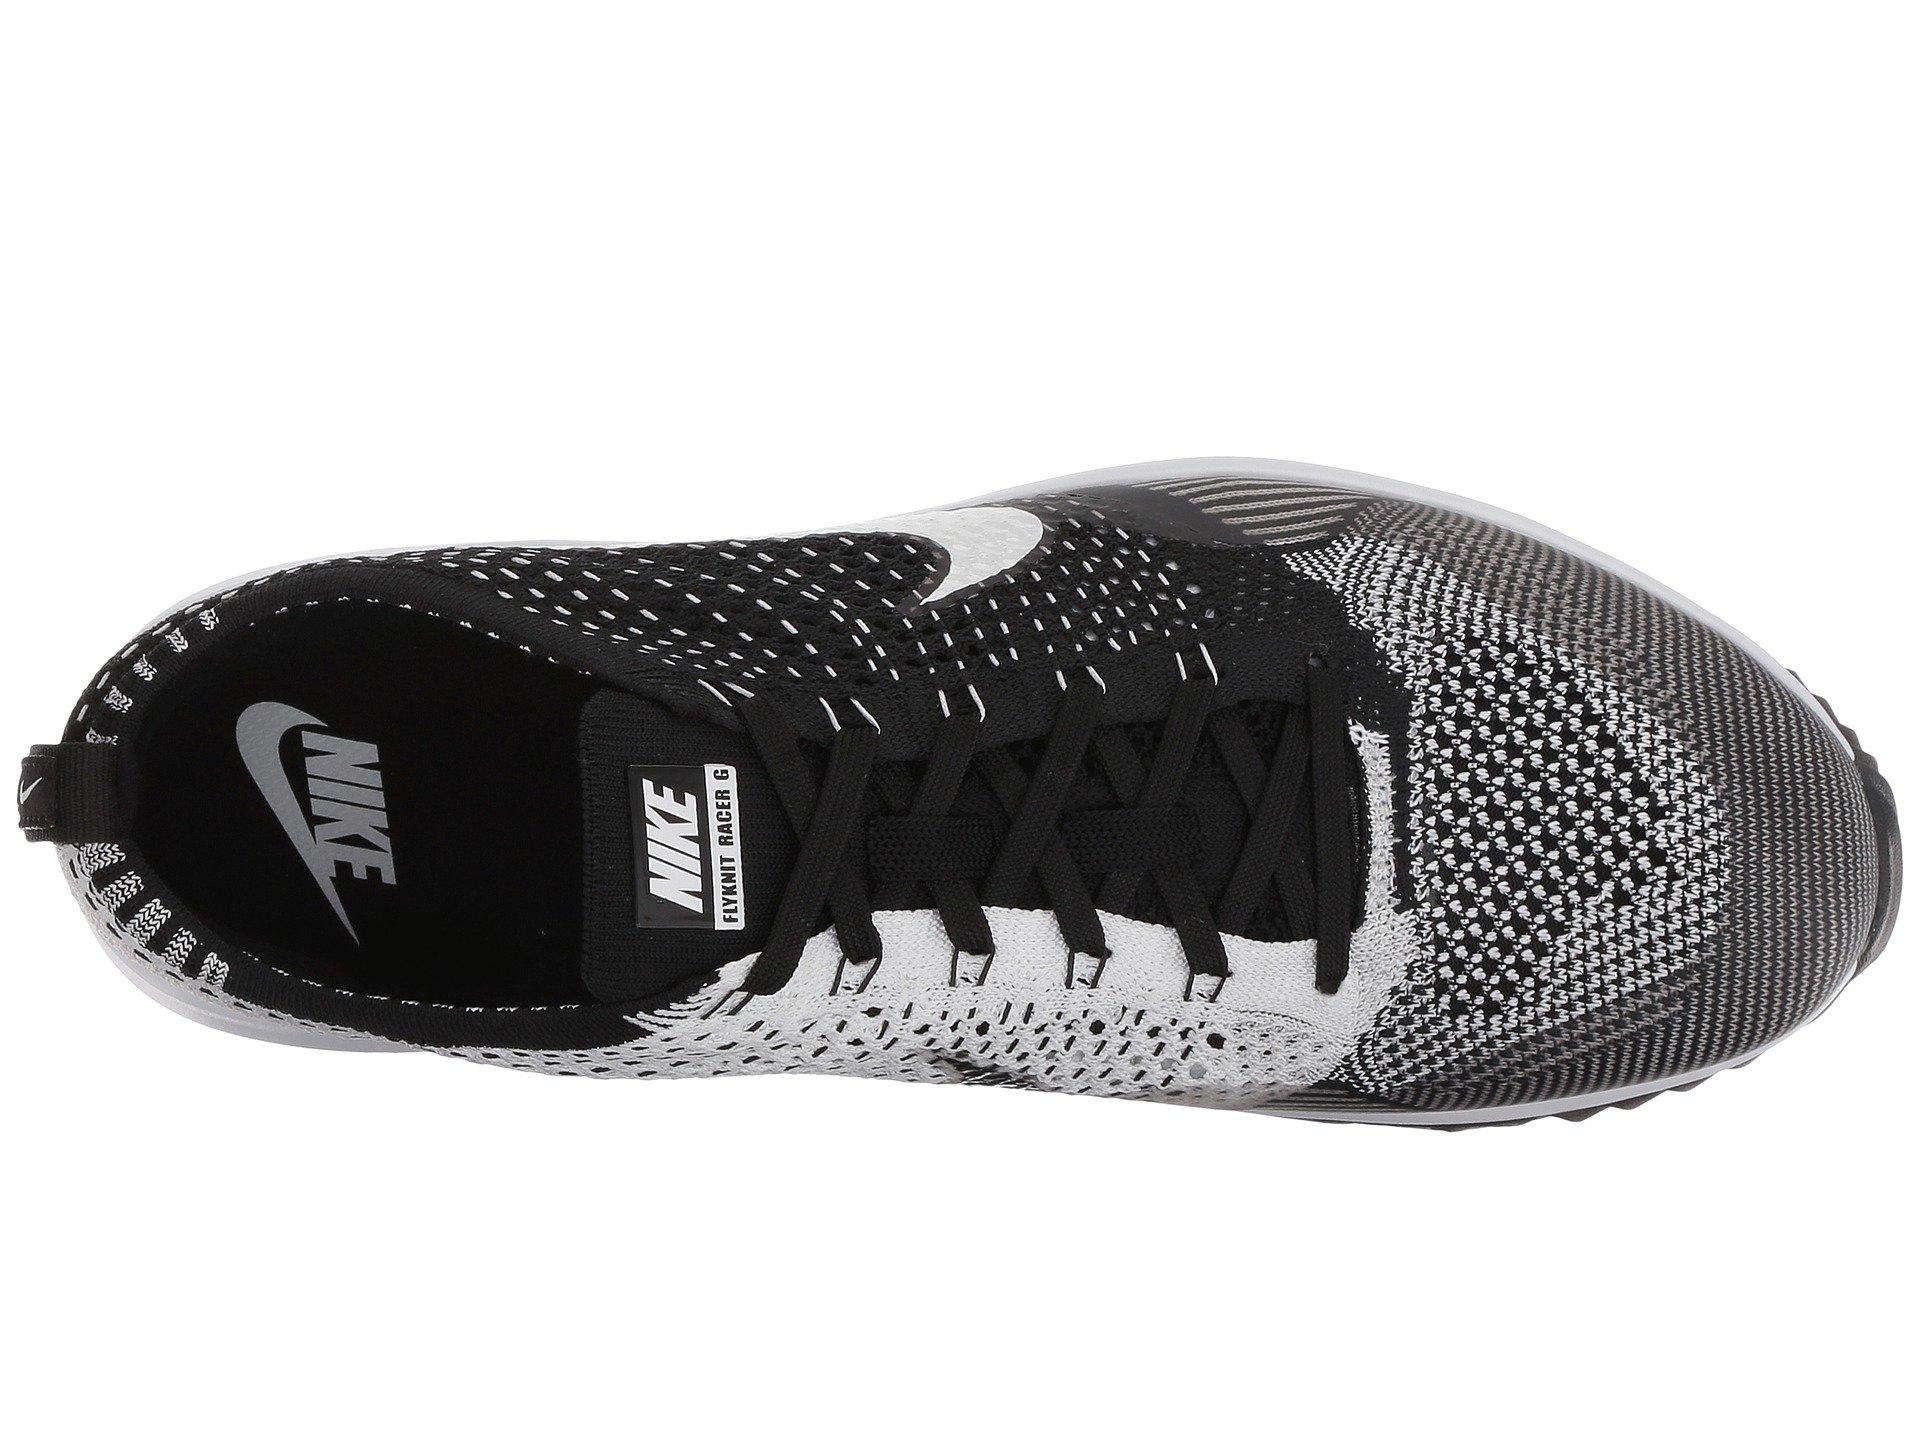 0eebda72a66ab Nike - Black Flyknit Racer G for Men - Lyst. View fullscreen